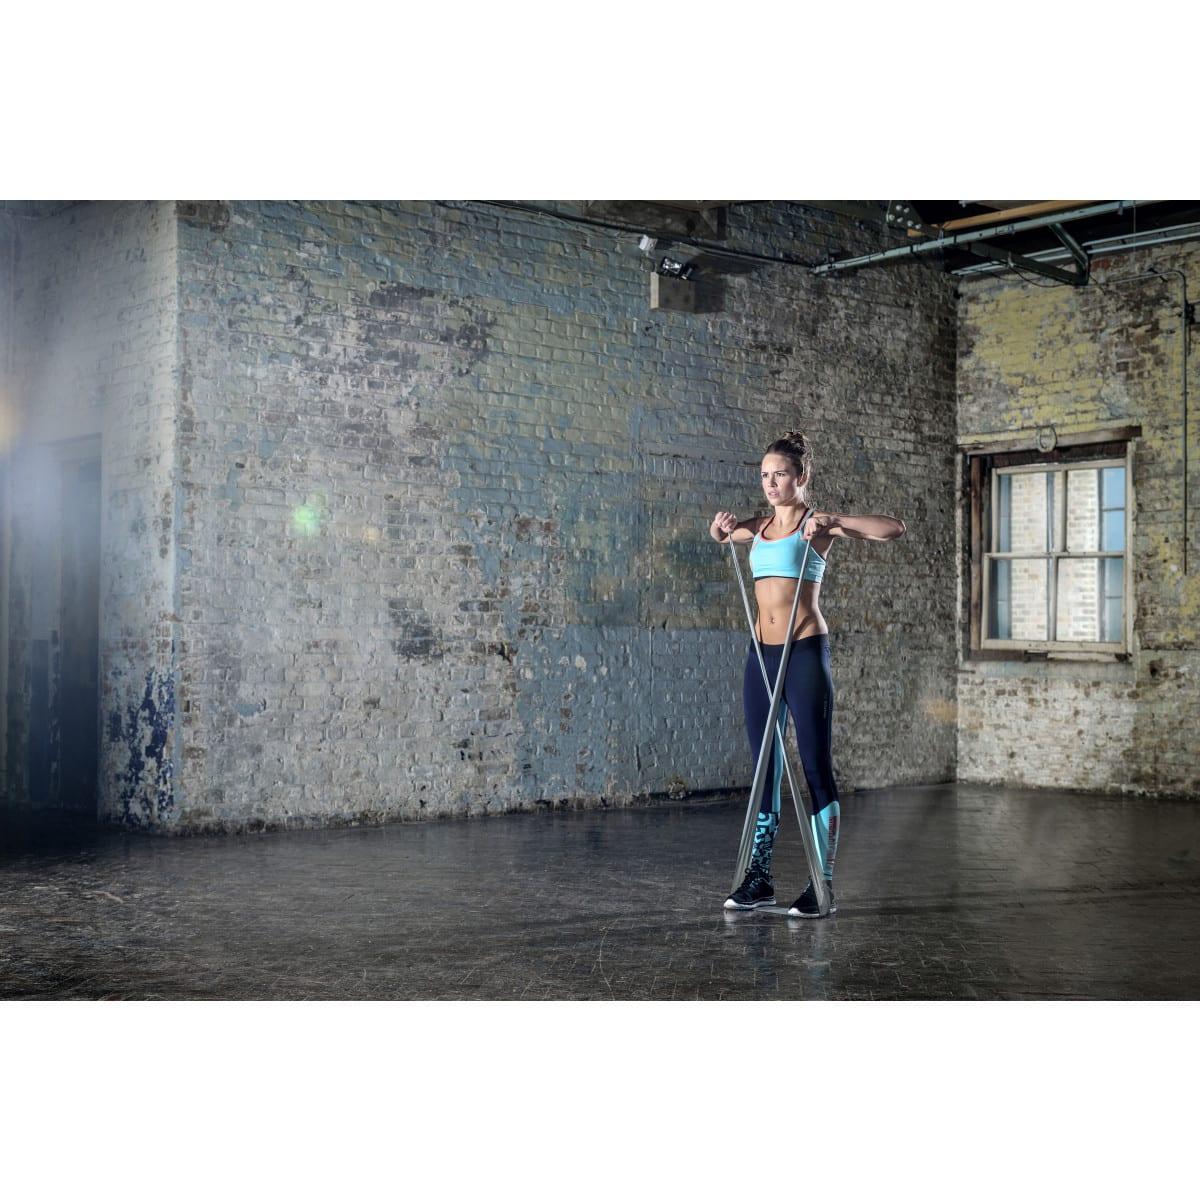 Reebok Bandes de tonification (set de 2), Femme en plein sport 1